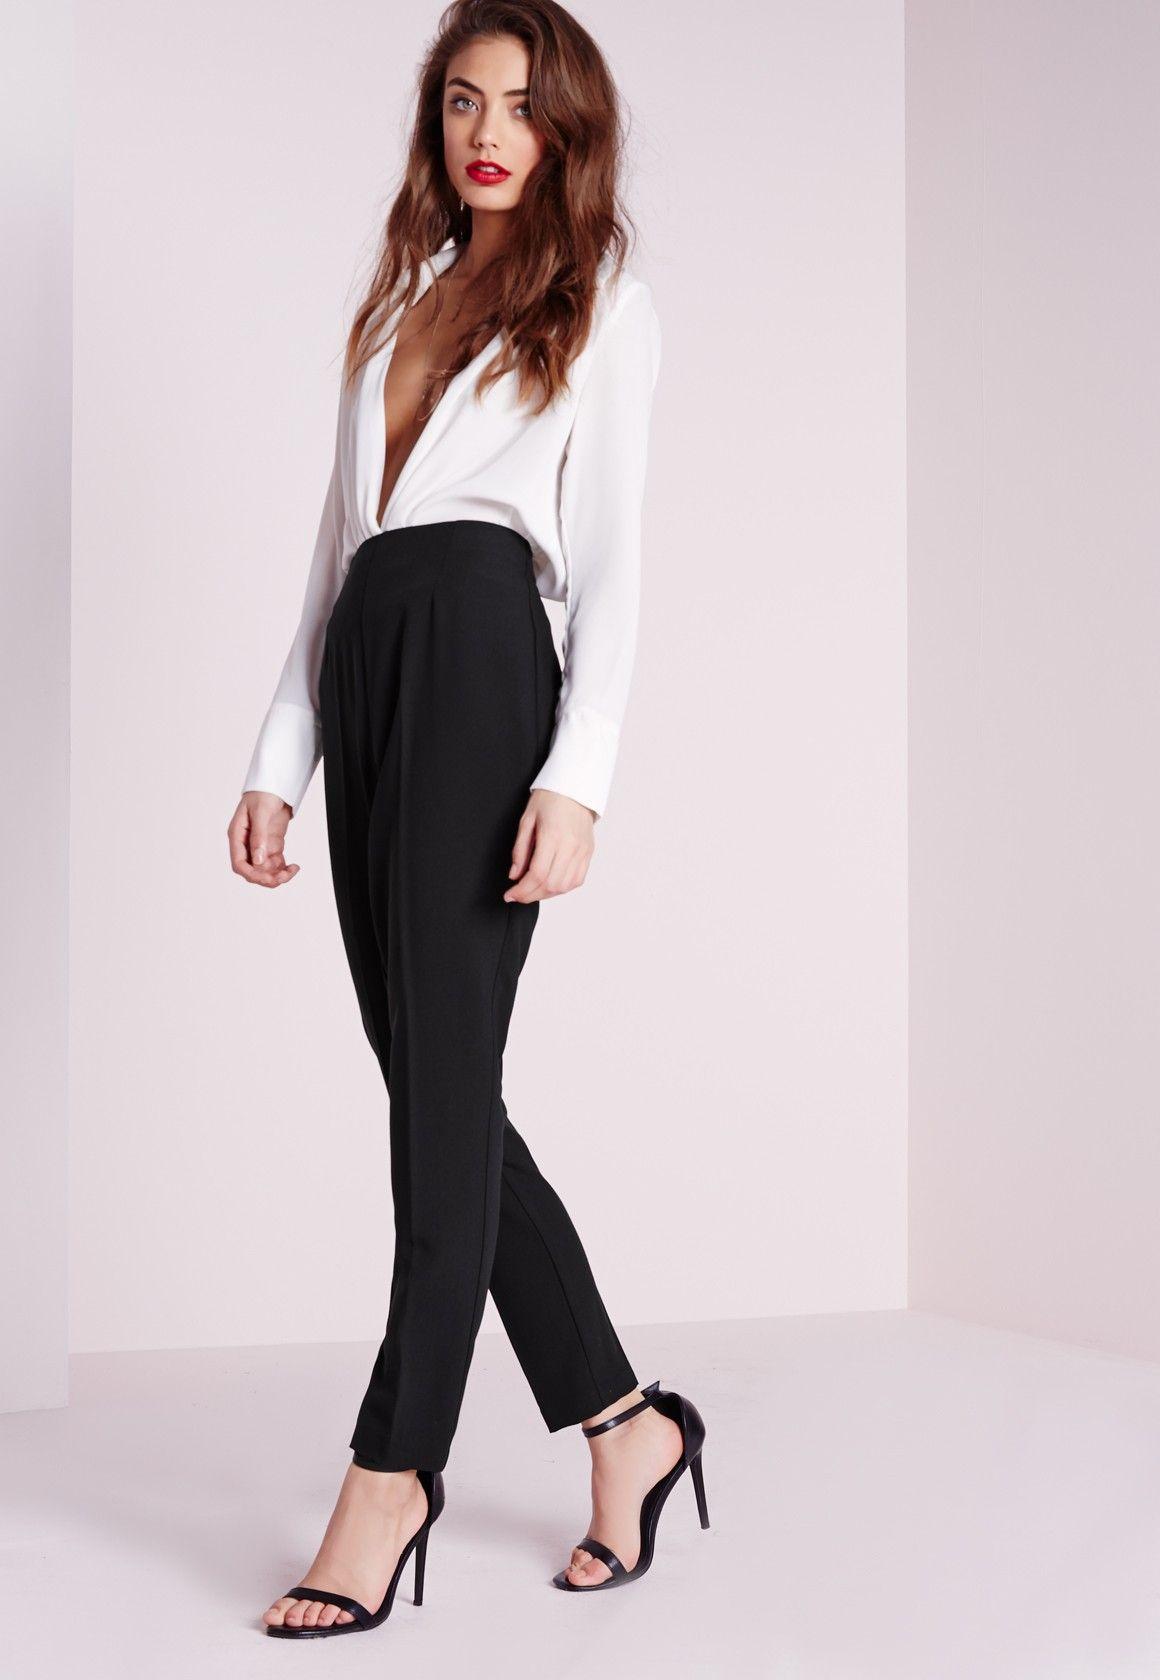 b38c202dfd43a5 Missguided - High Waist Cigarette Pants Black | SPRING ...